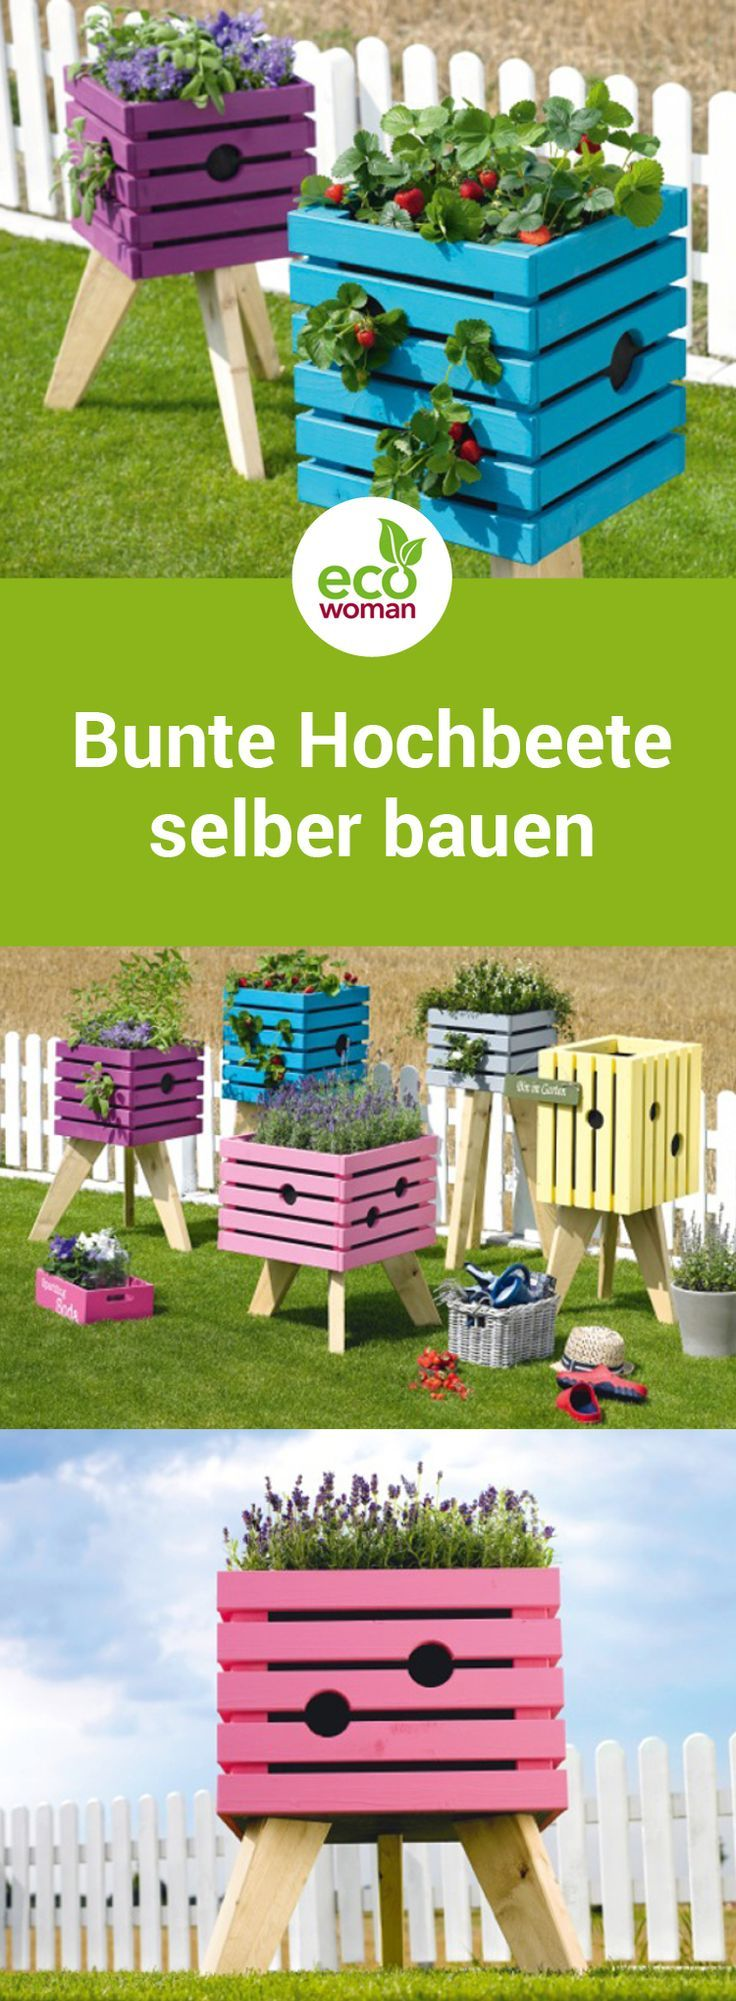 Tolles Hochbeet selber bauen, bunte Pflanzenkiste #herbsgarden